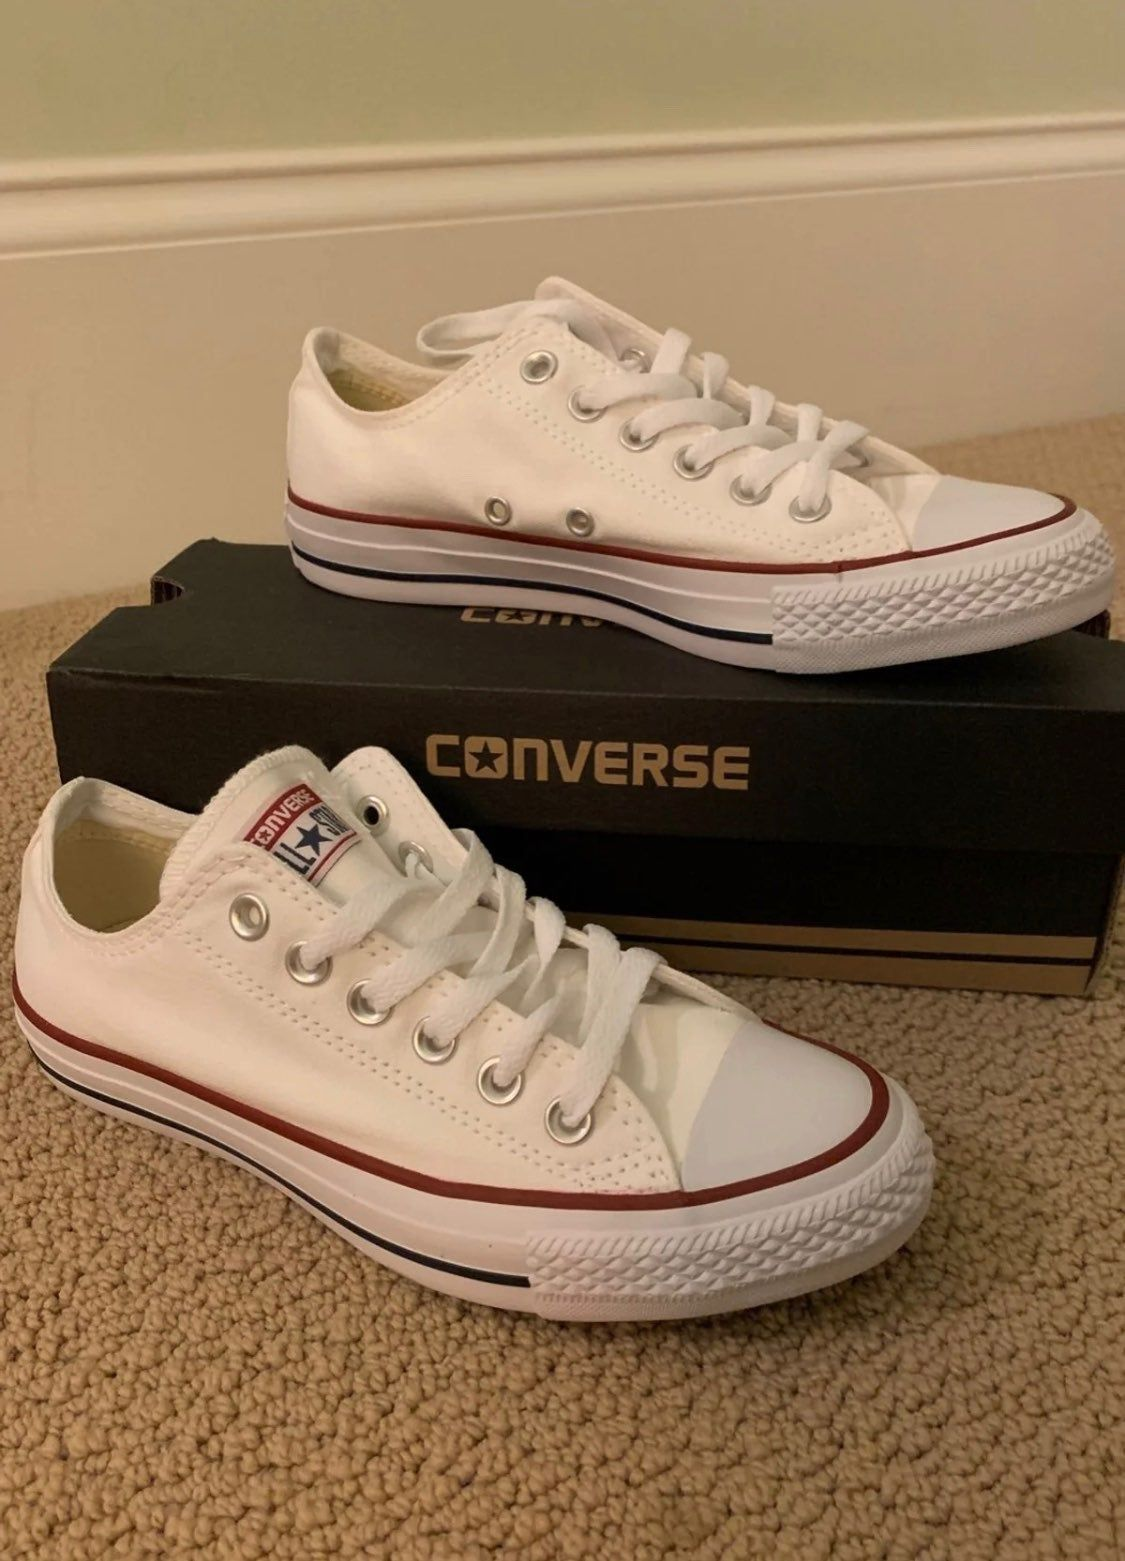 Never worn white converse size 7 women